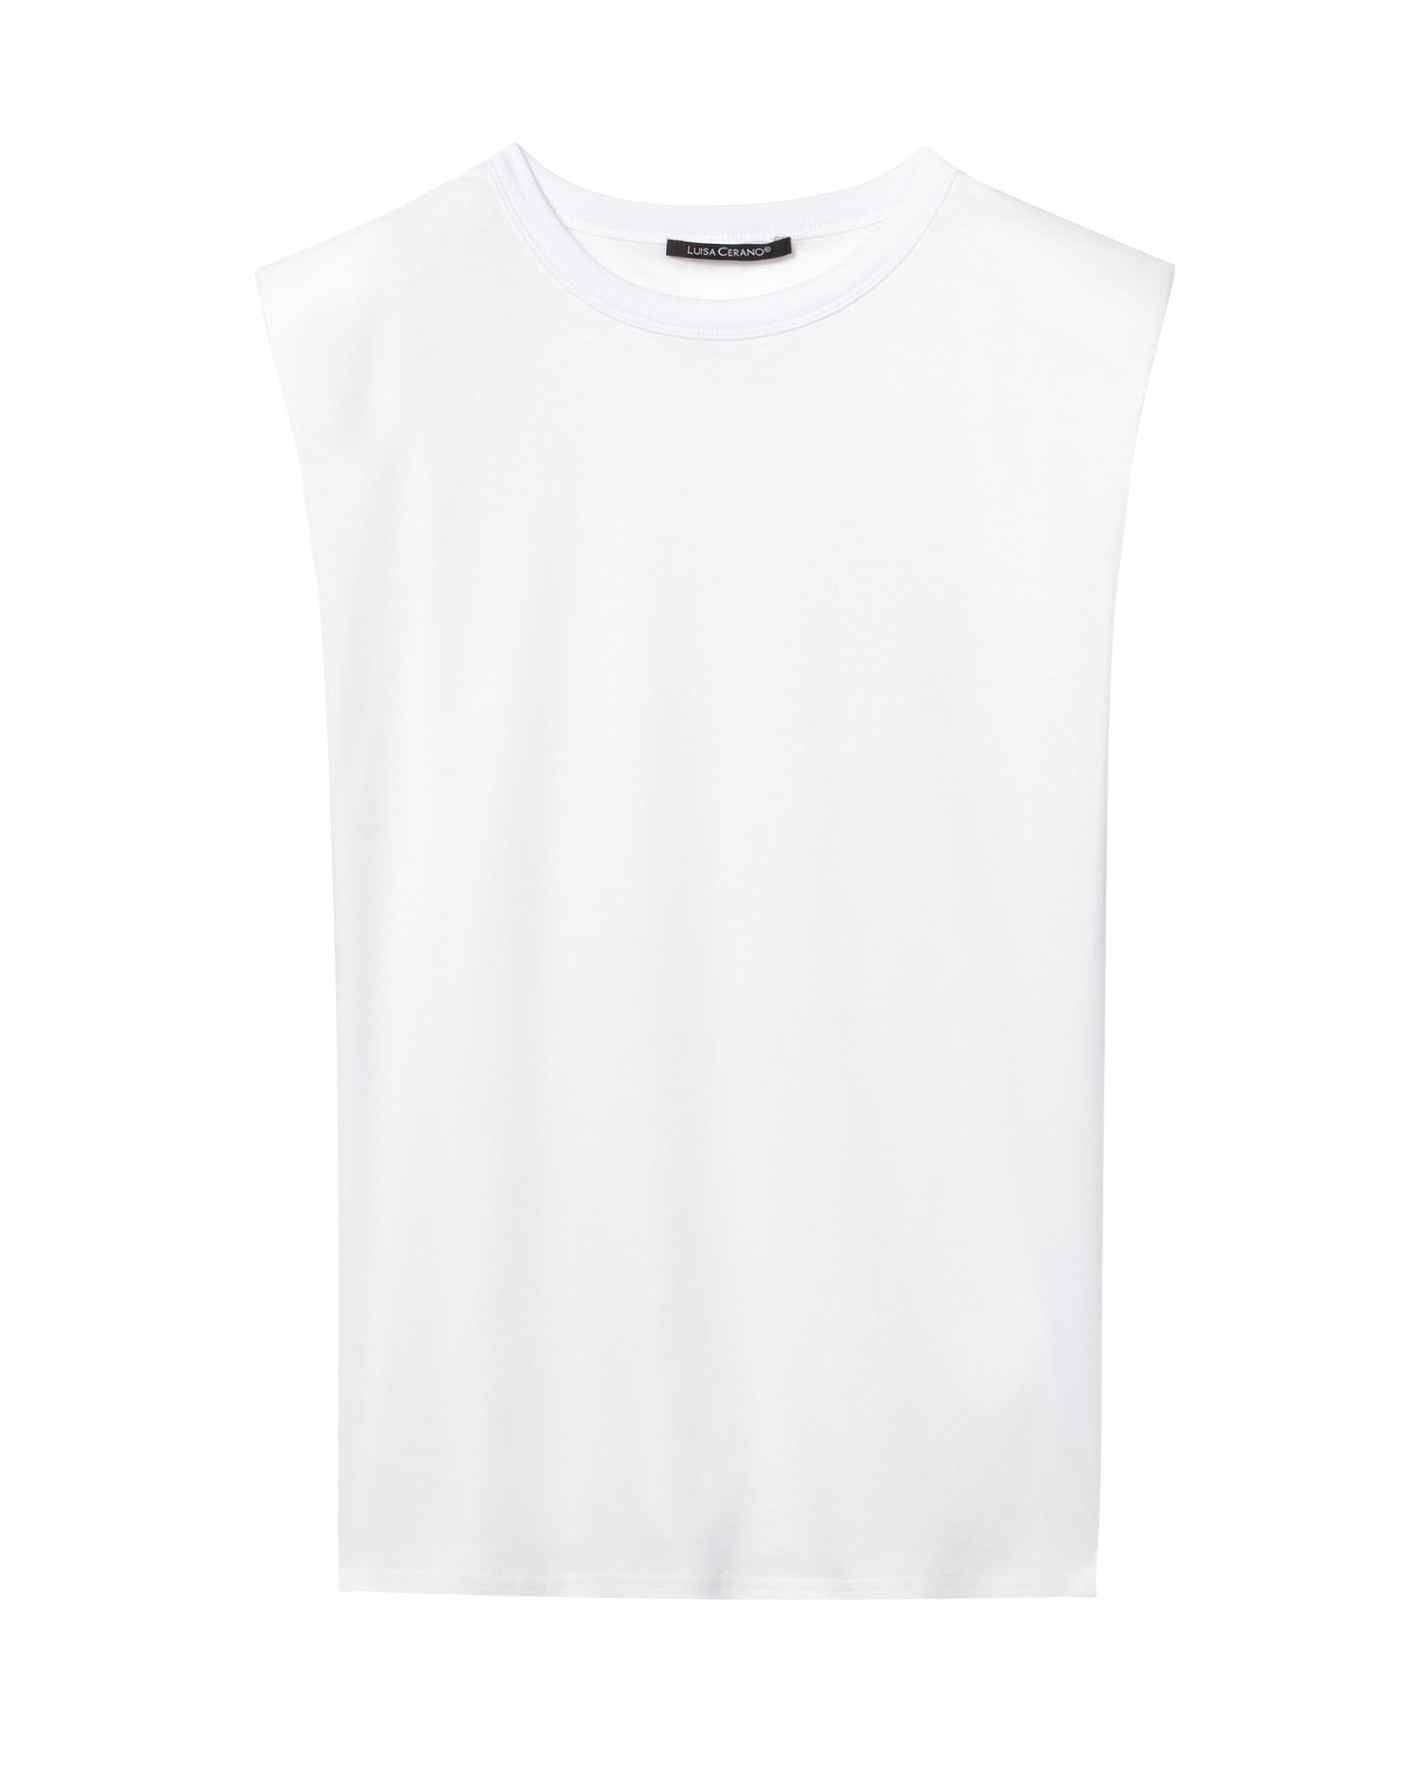 LUISA CERANO - Damen T-Shirt - T-Shirt mit Schulterbetonung - White